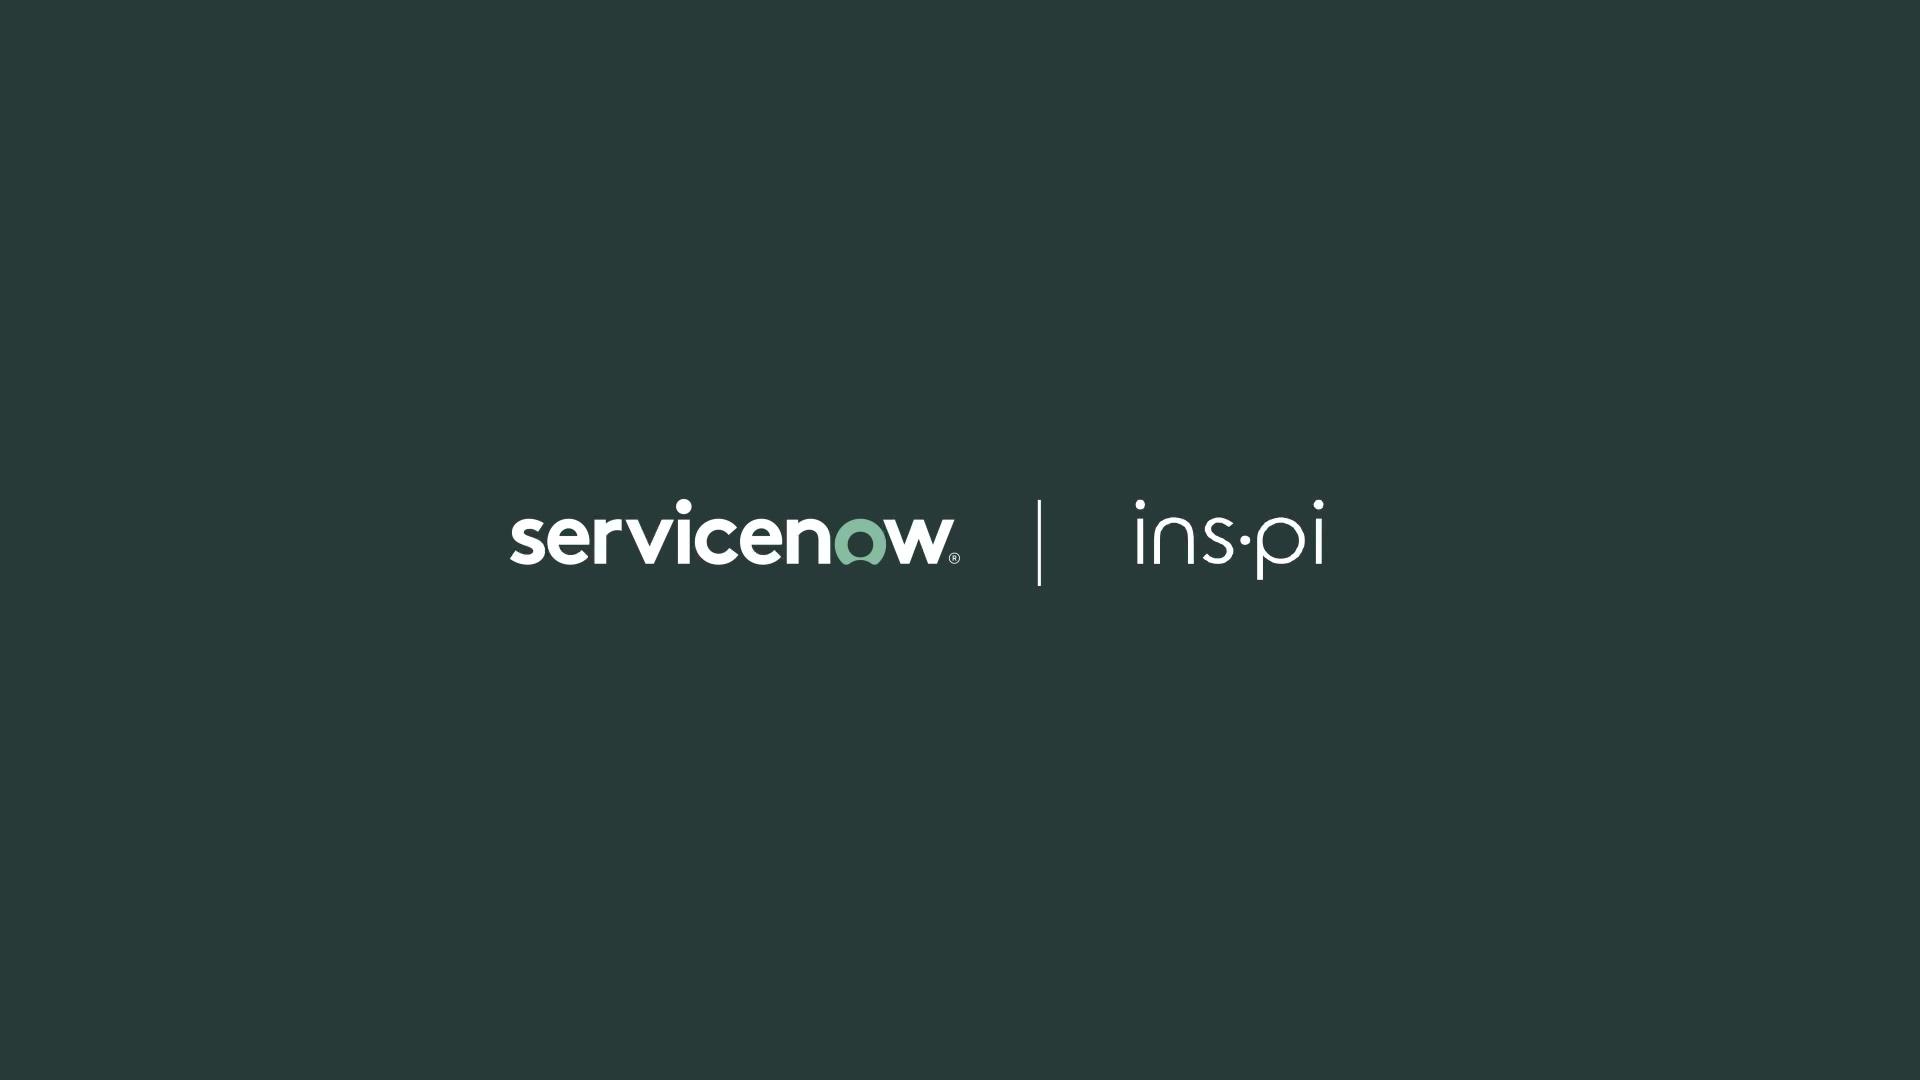 ServiceNow ins-pi Promotion 2021